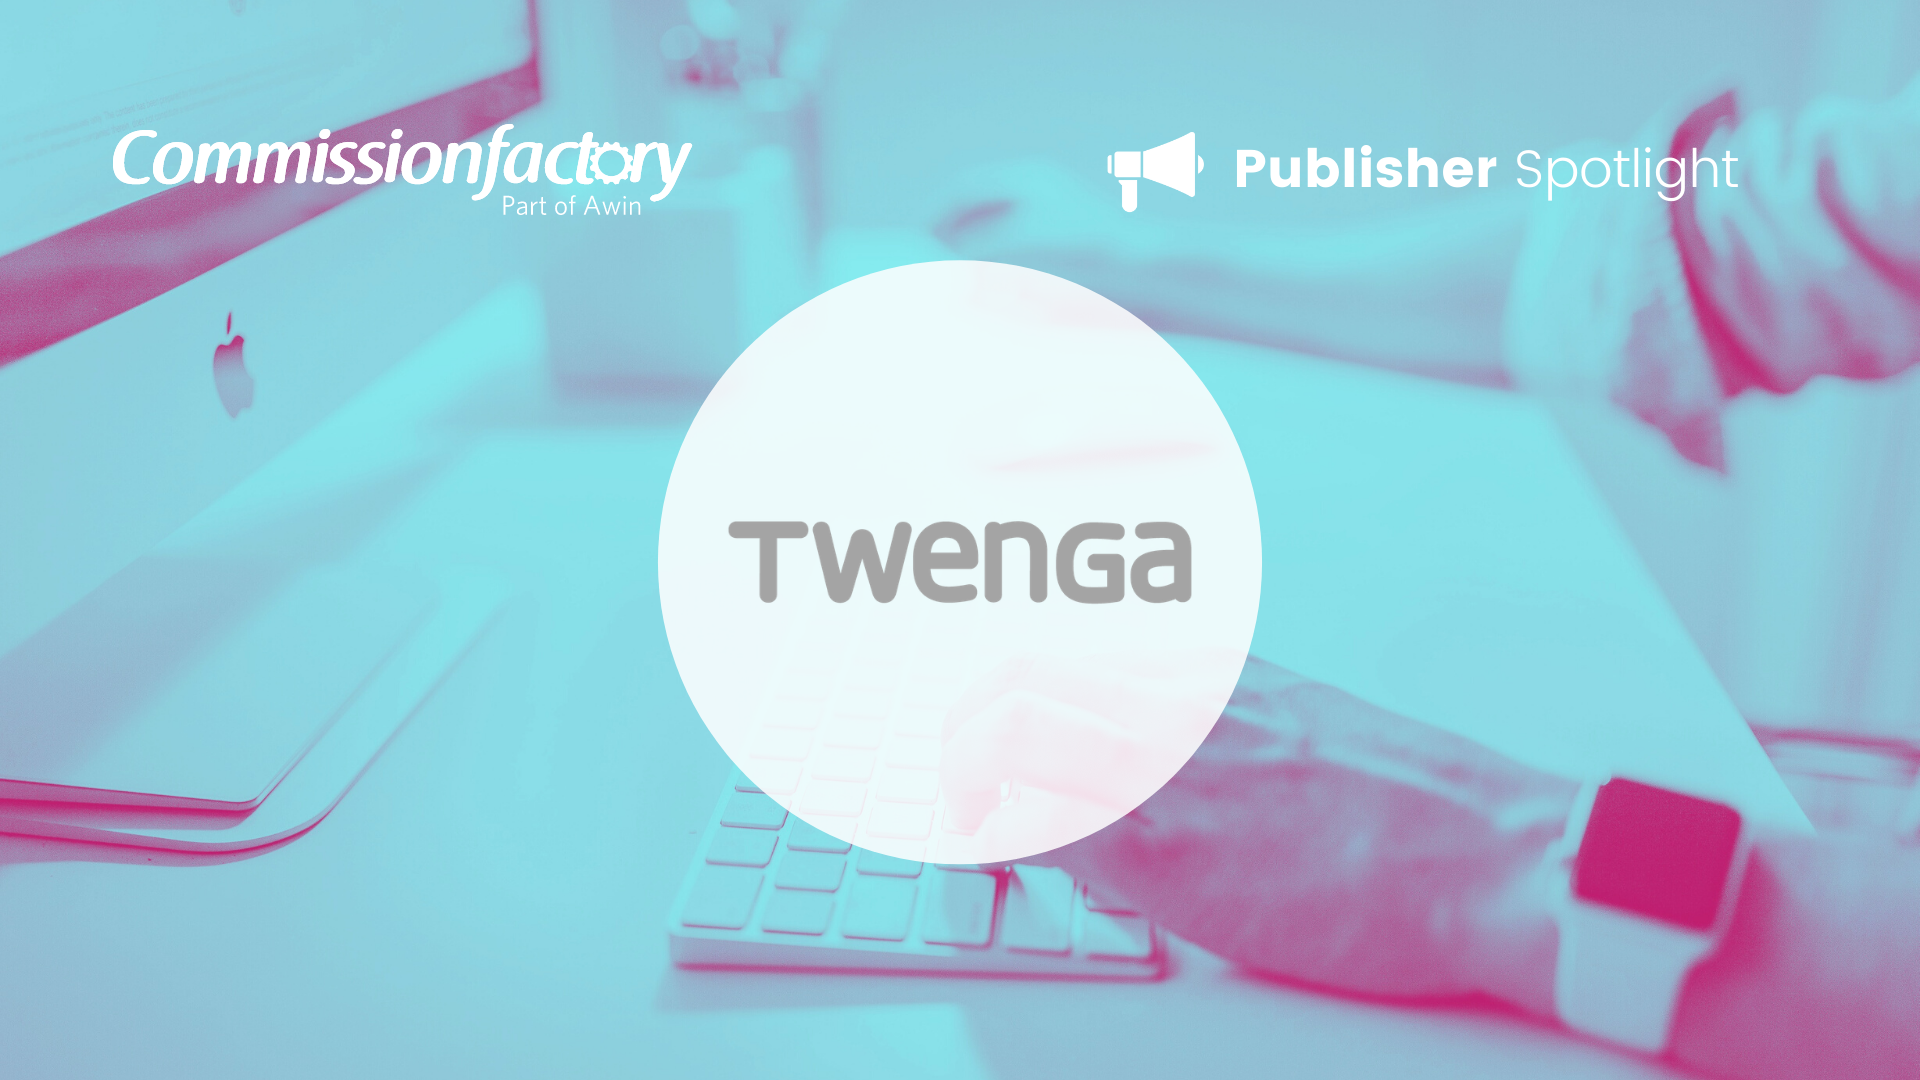 Twenga Publisher Spotlight